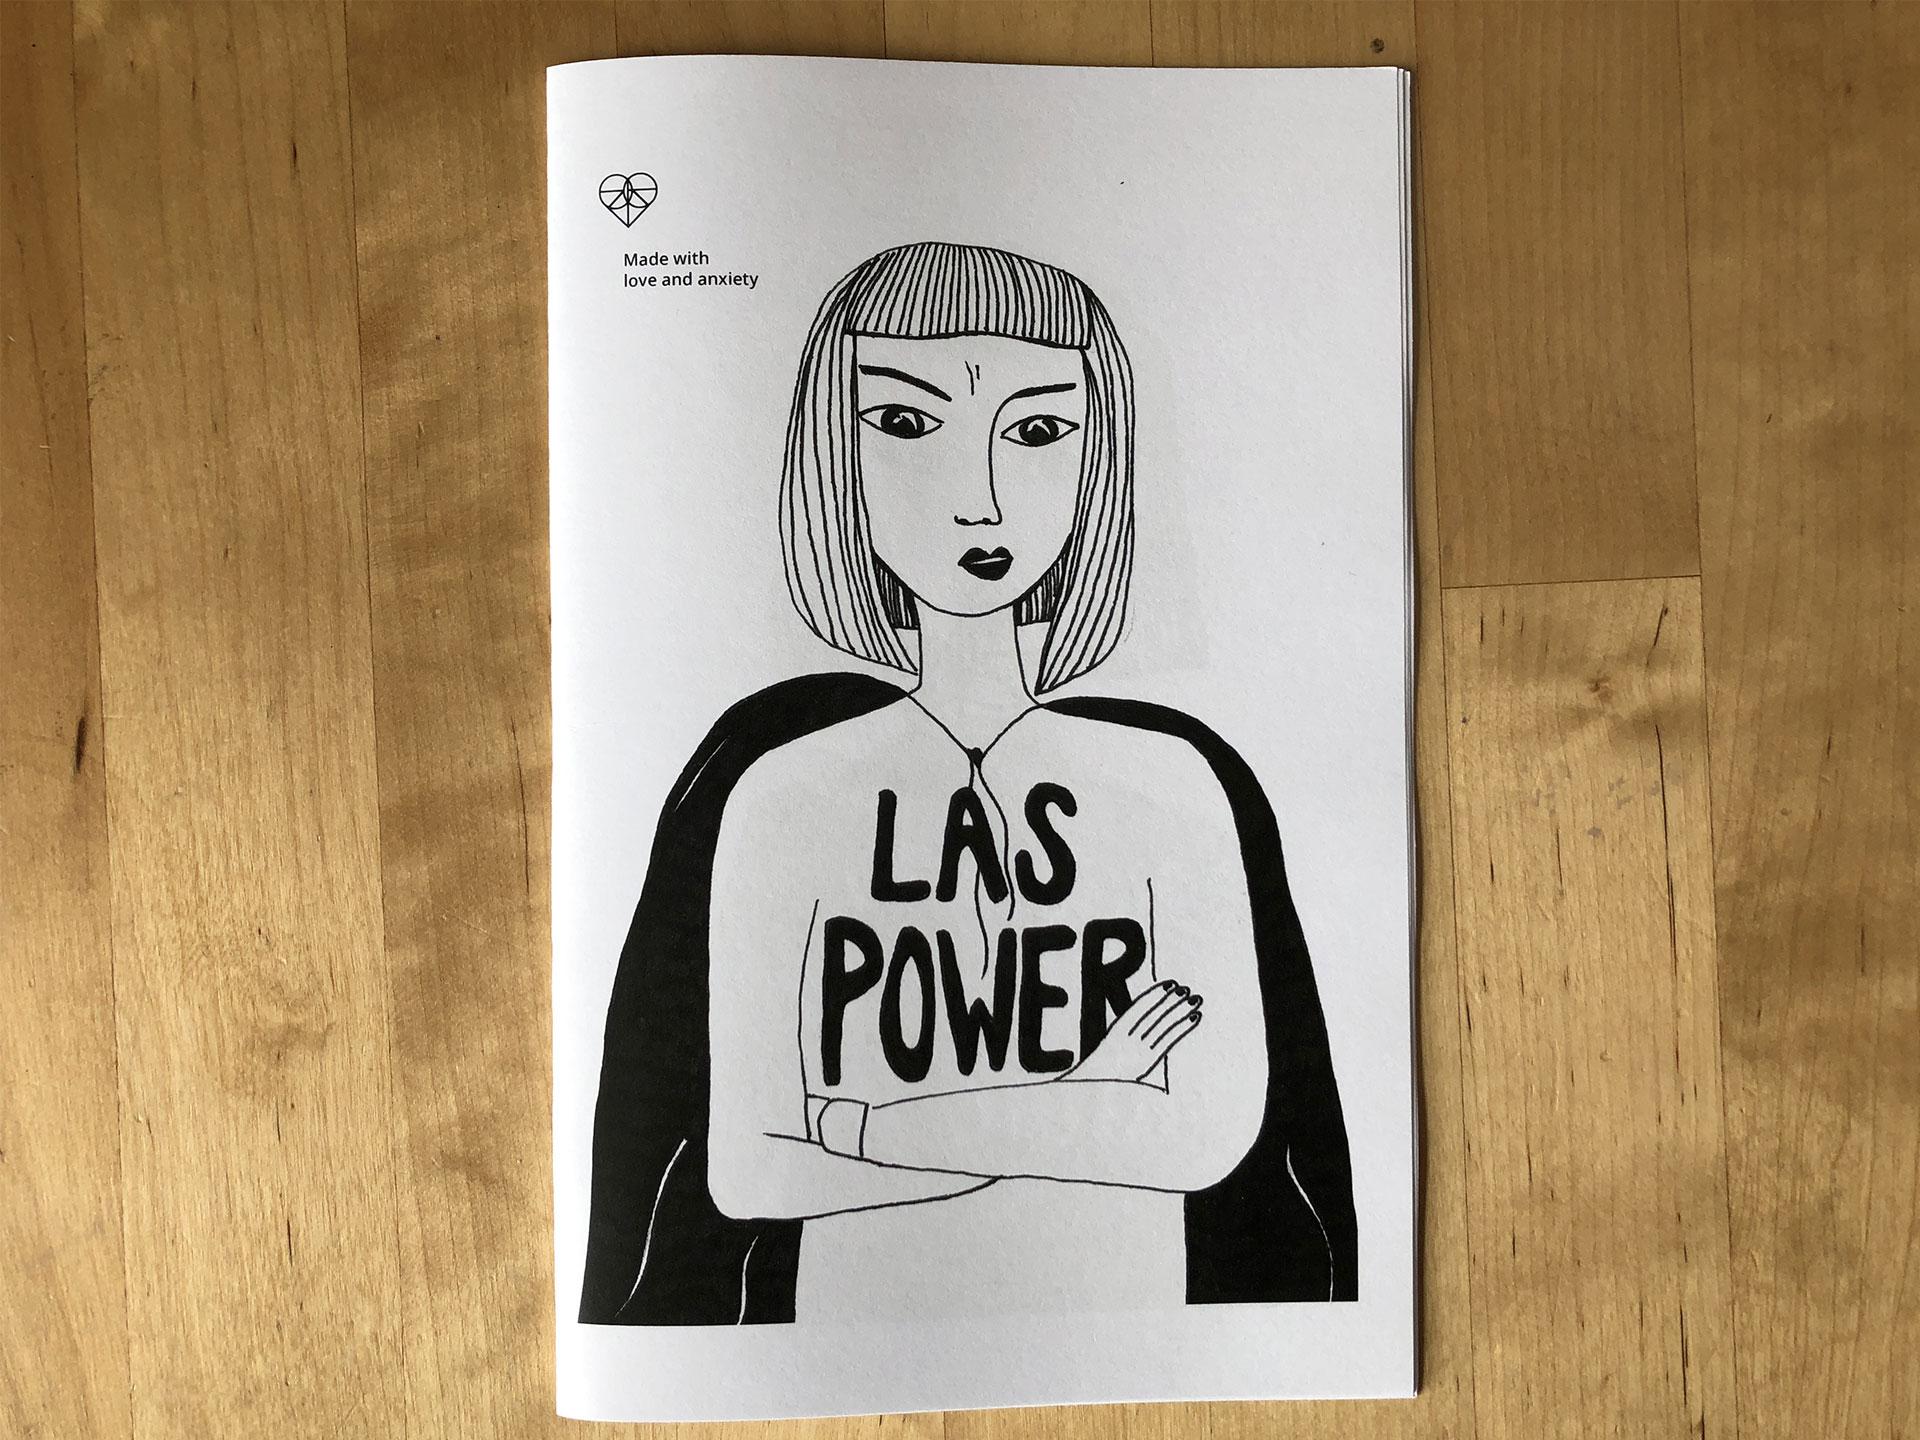 LasPower2-01.jpg